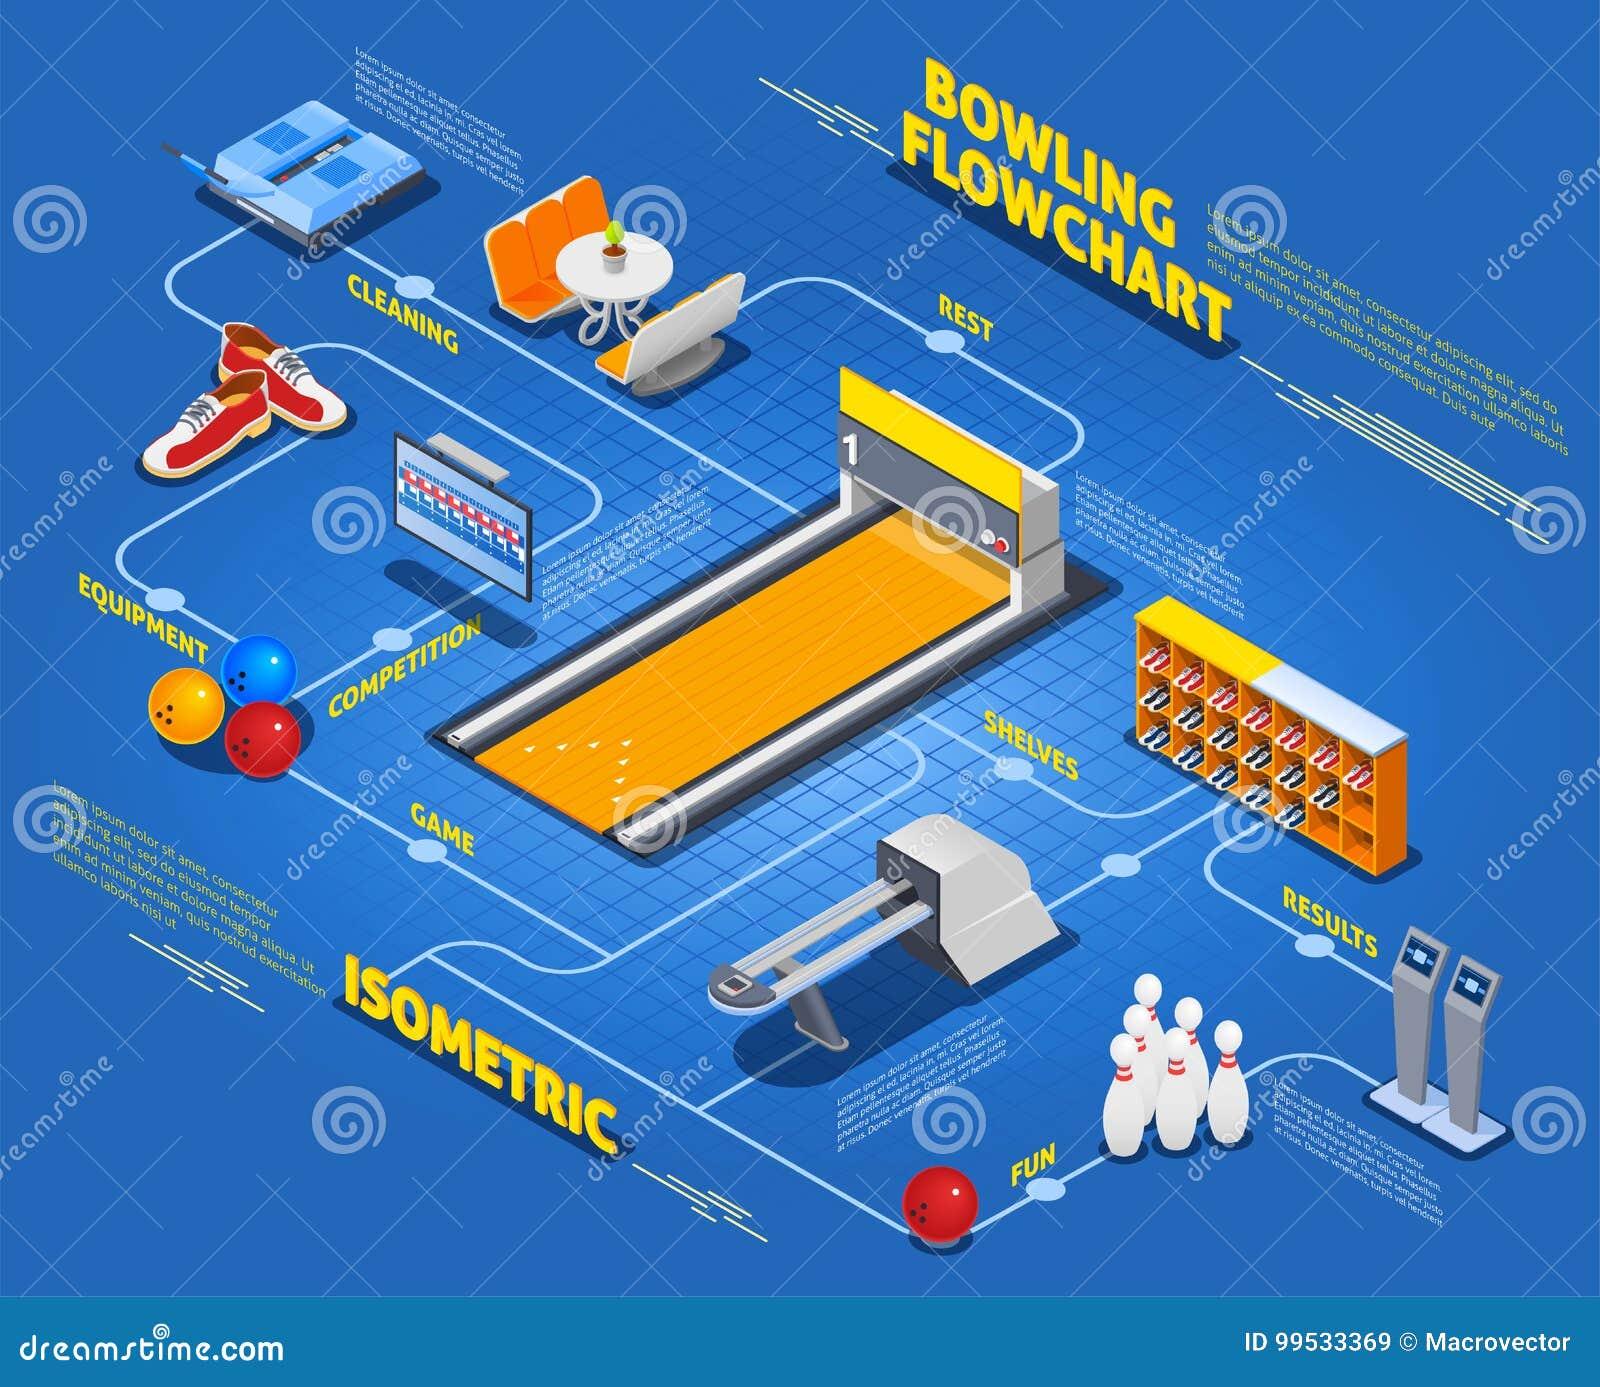 Bowling Isometric Flowchart